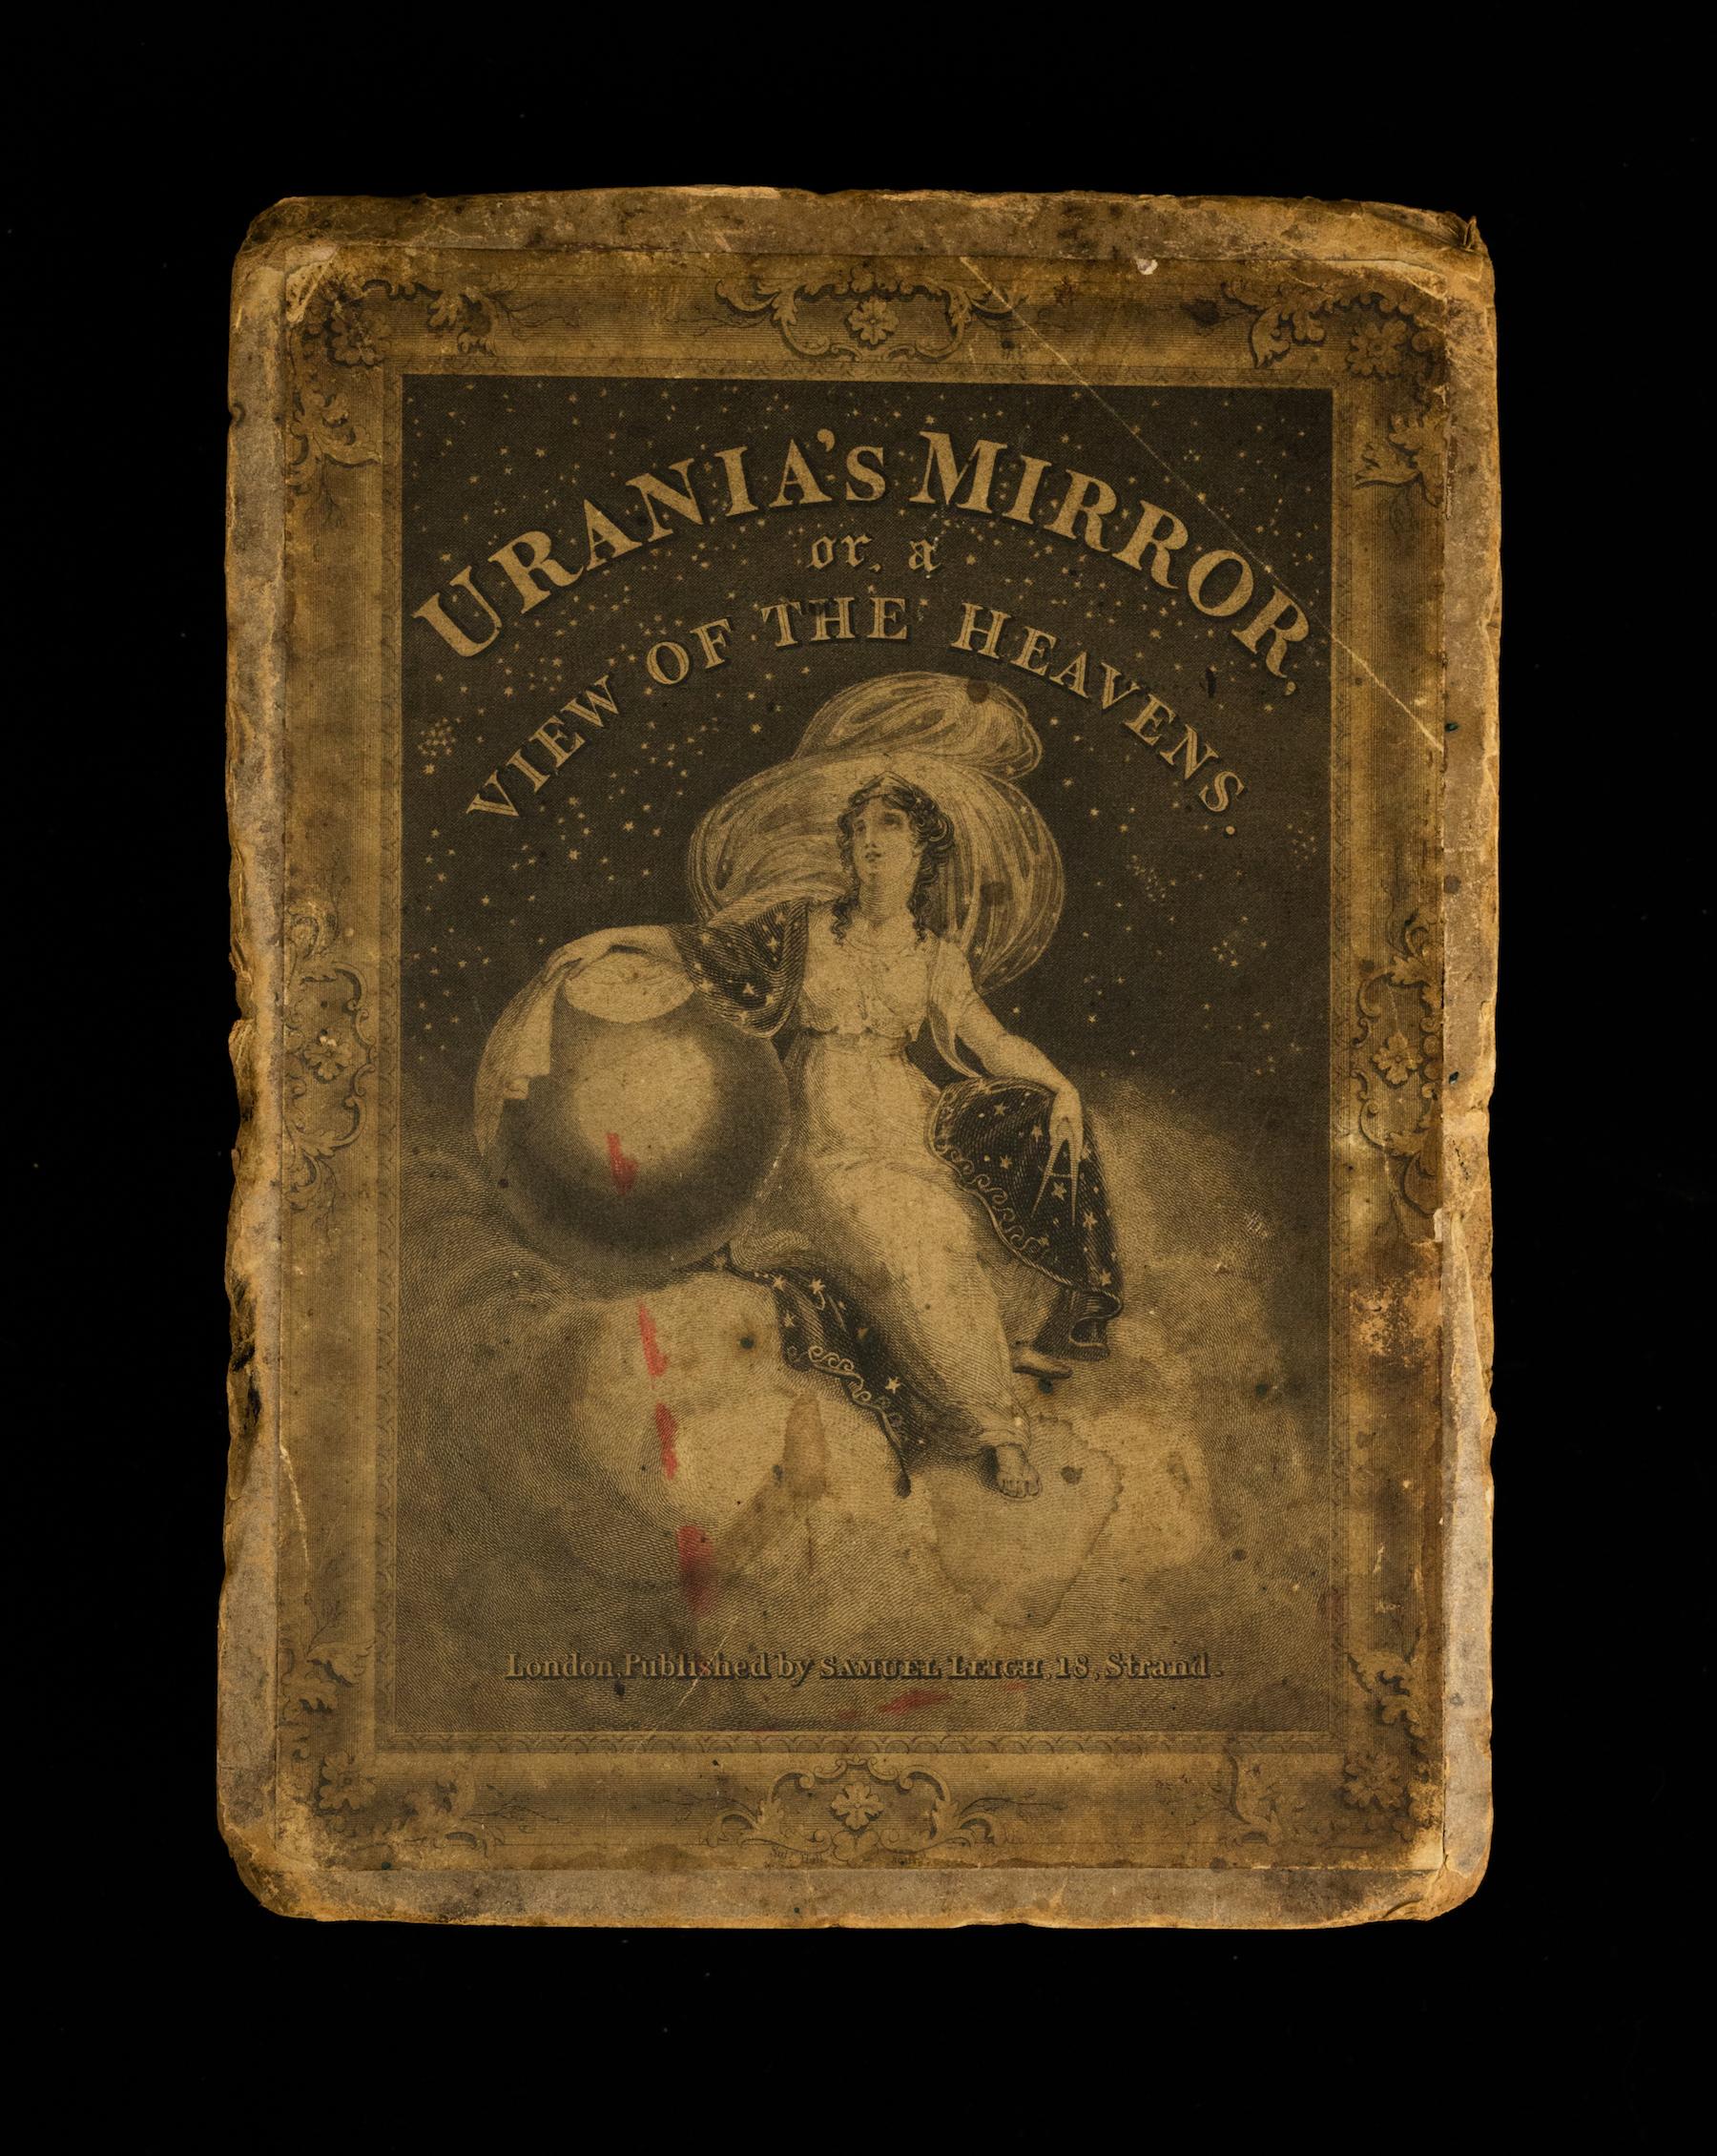 Cover of Urania's Mirror